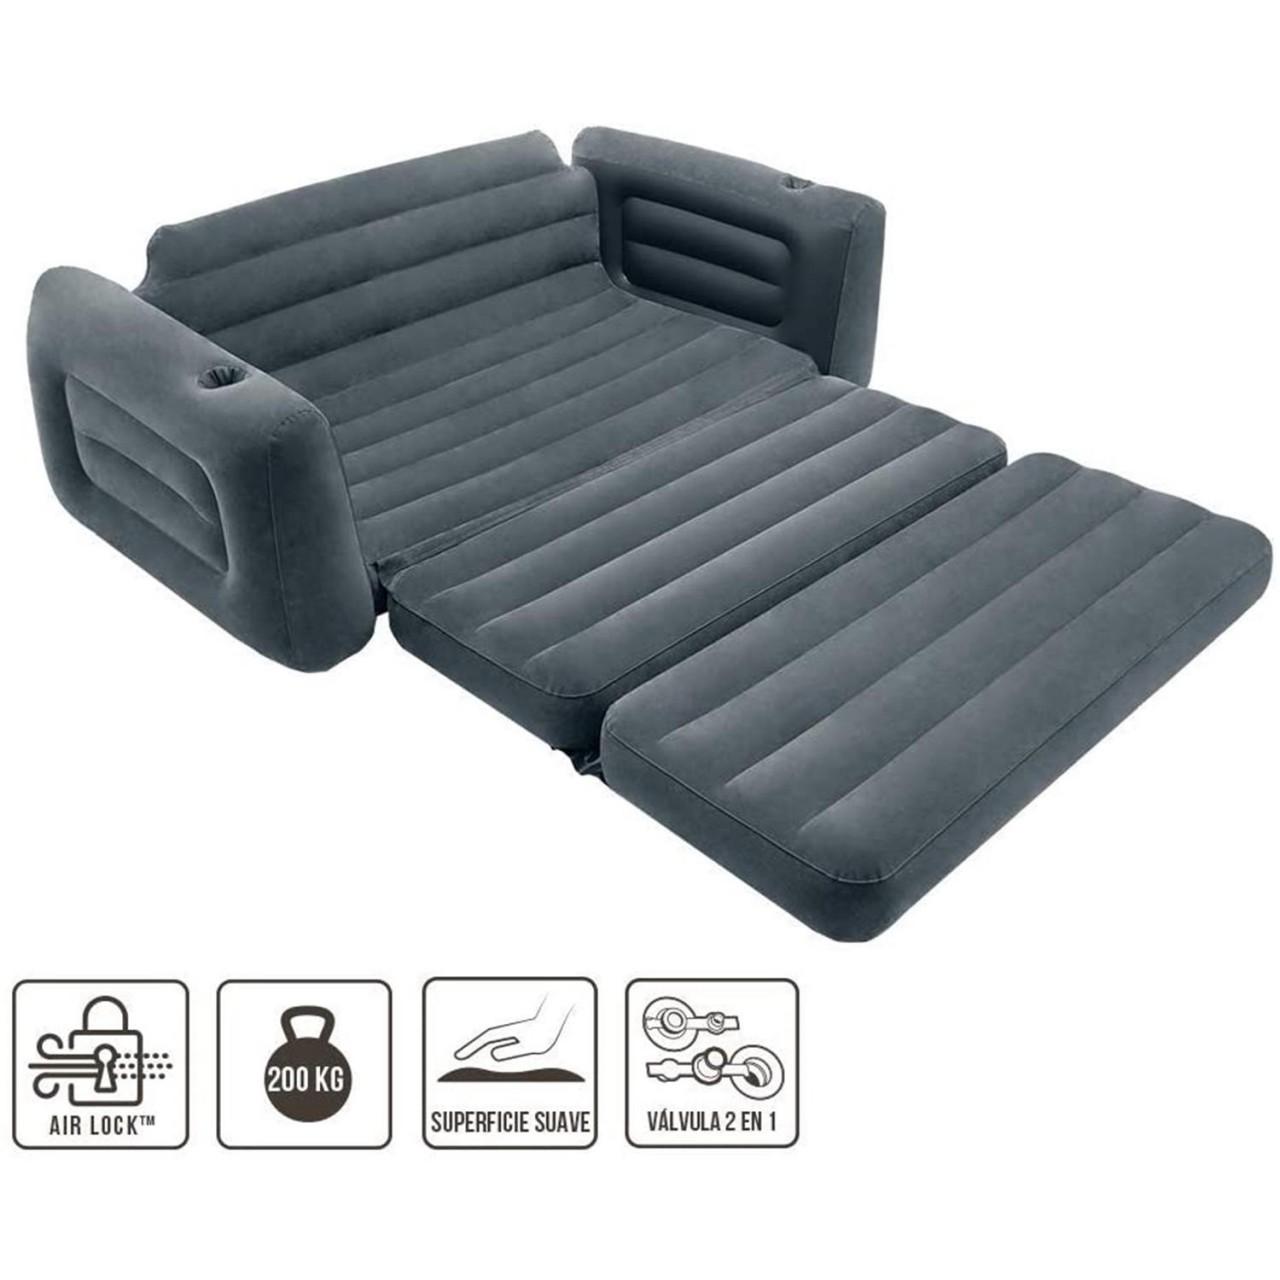 Intex Sofa Couch Lounge Luftsofa Luftbett Gästebett aufblasbar 203x224x66 cm 66552